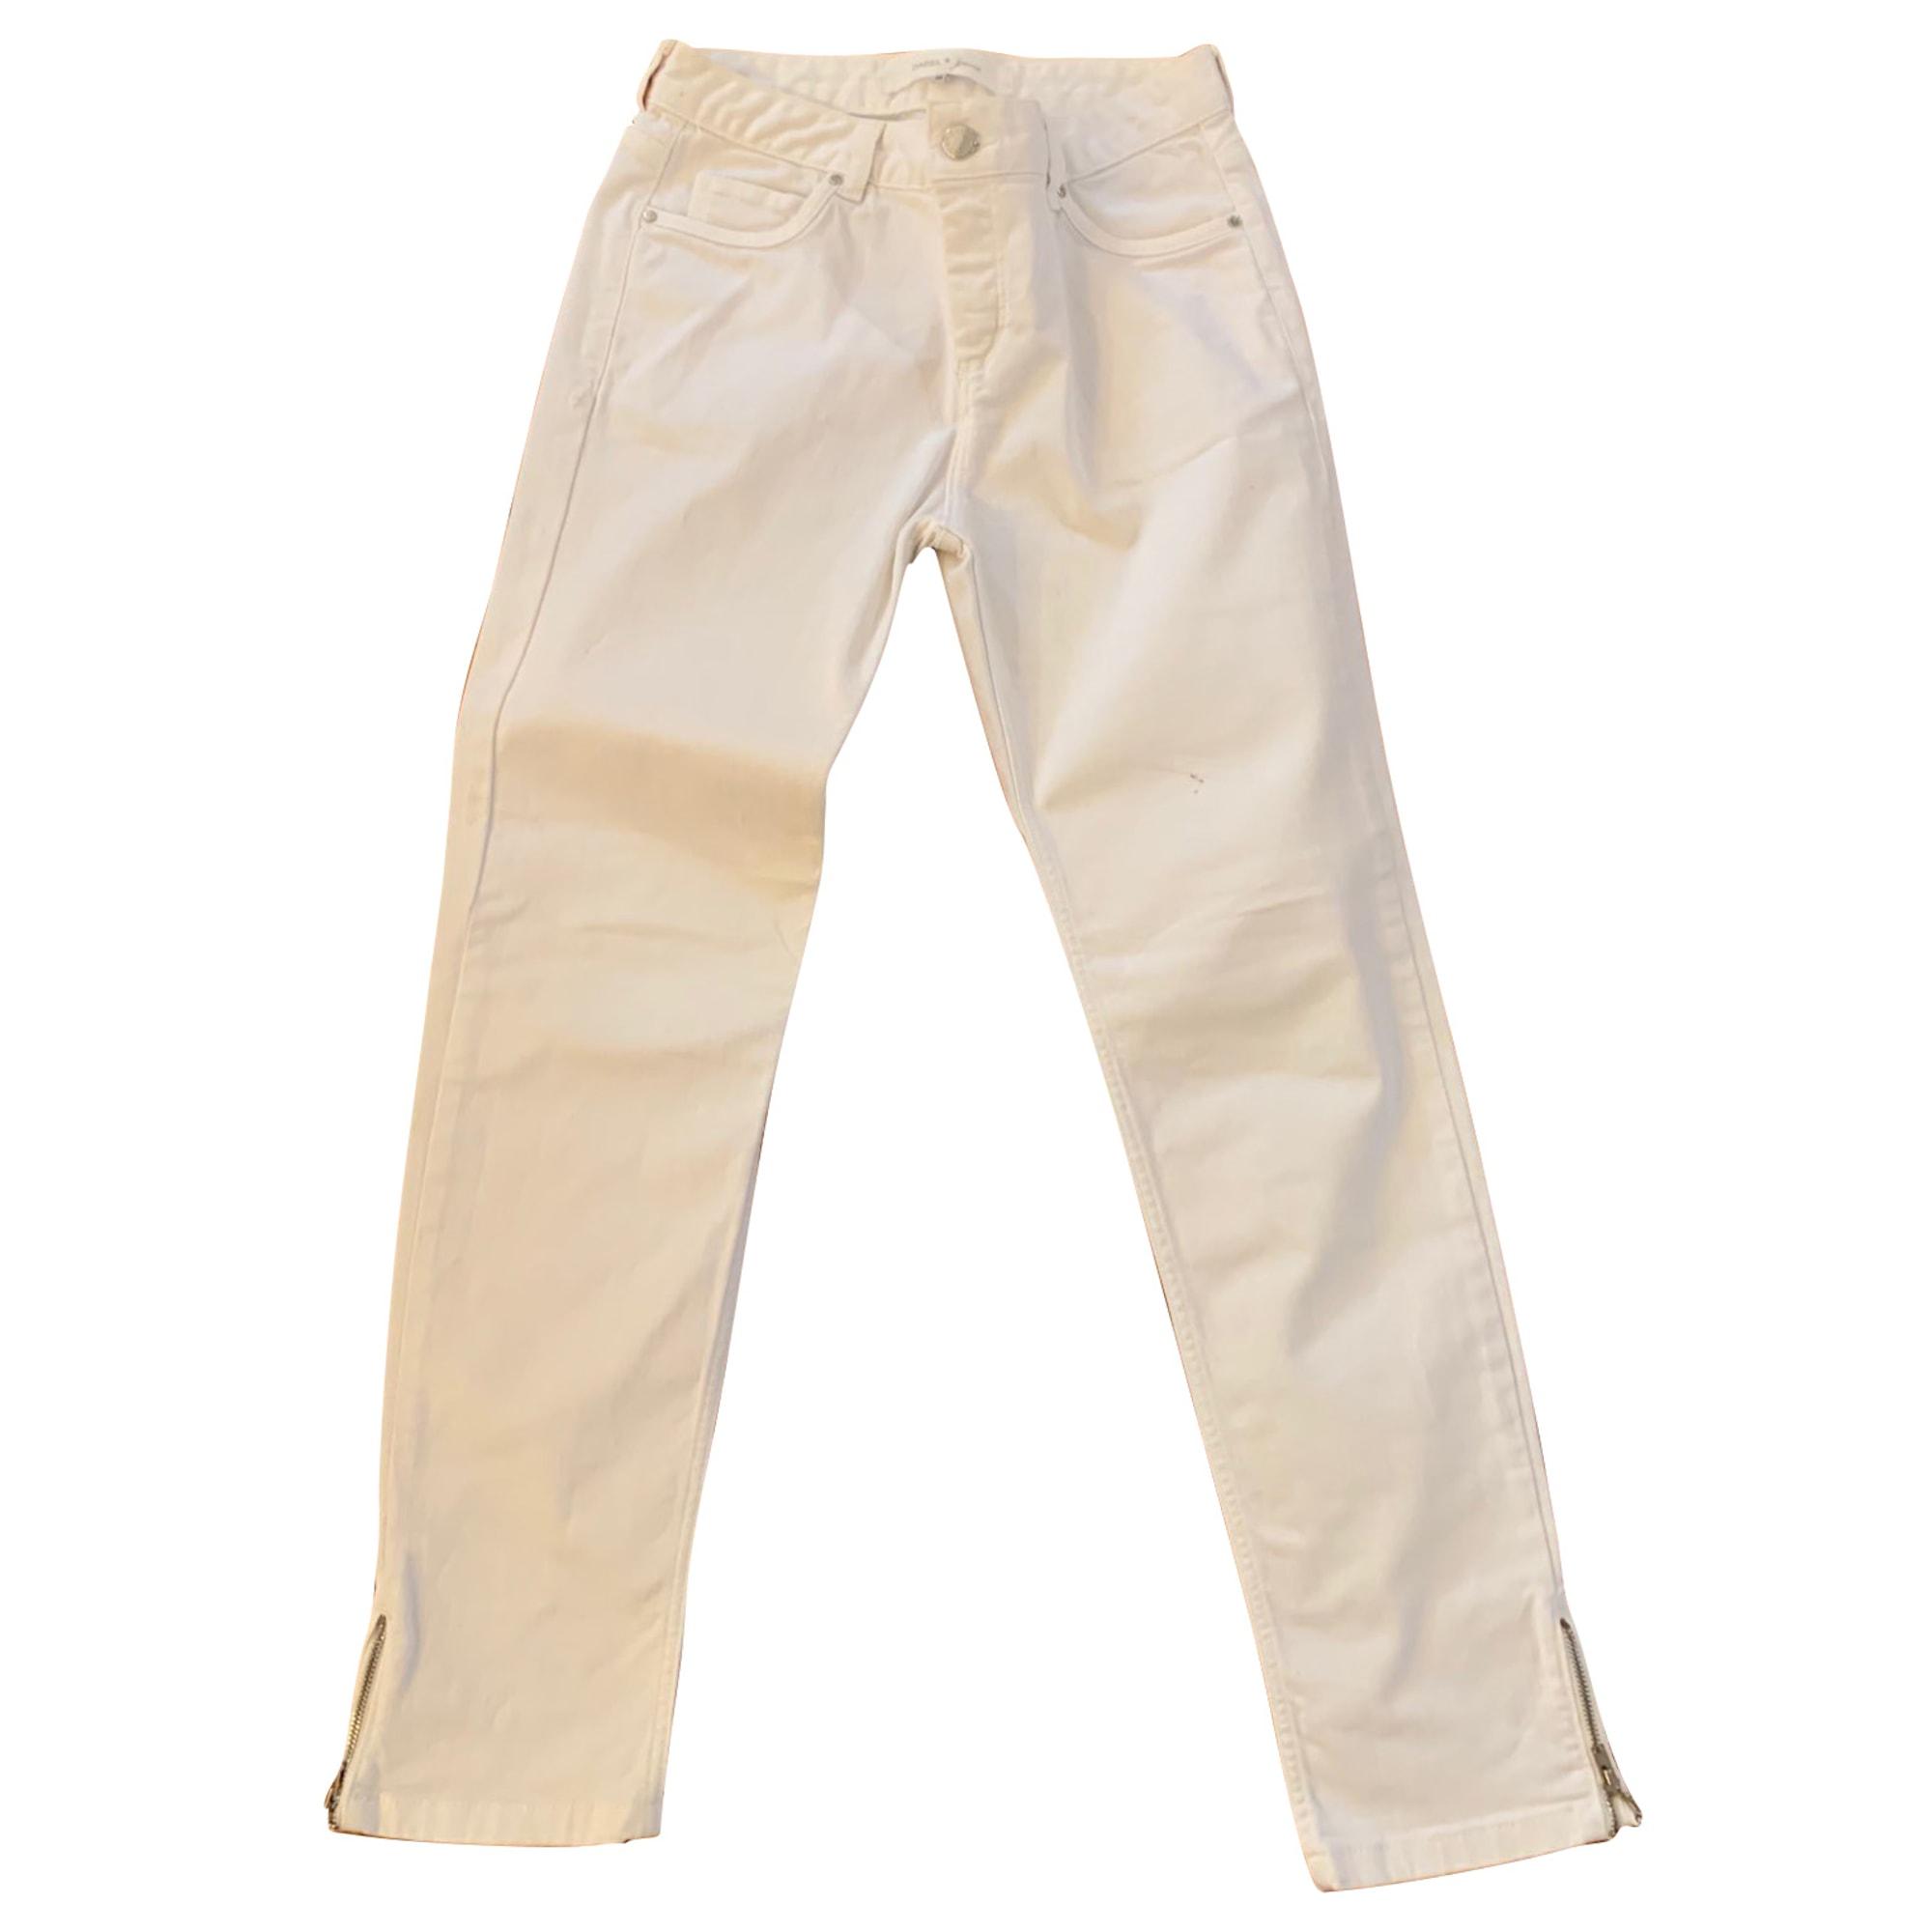 Pantalon droit GERARD DAREL Blanc, blanc cassé, écru